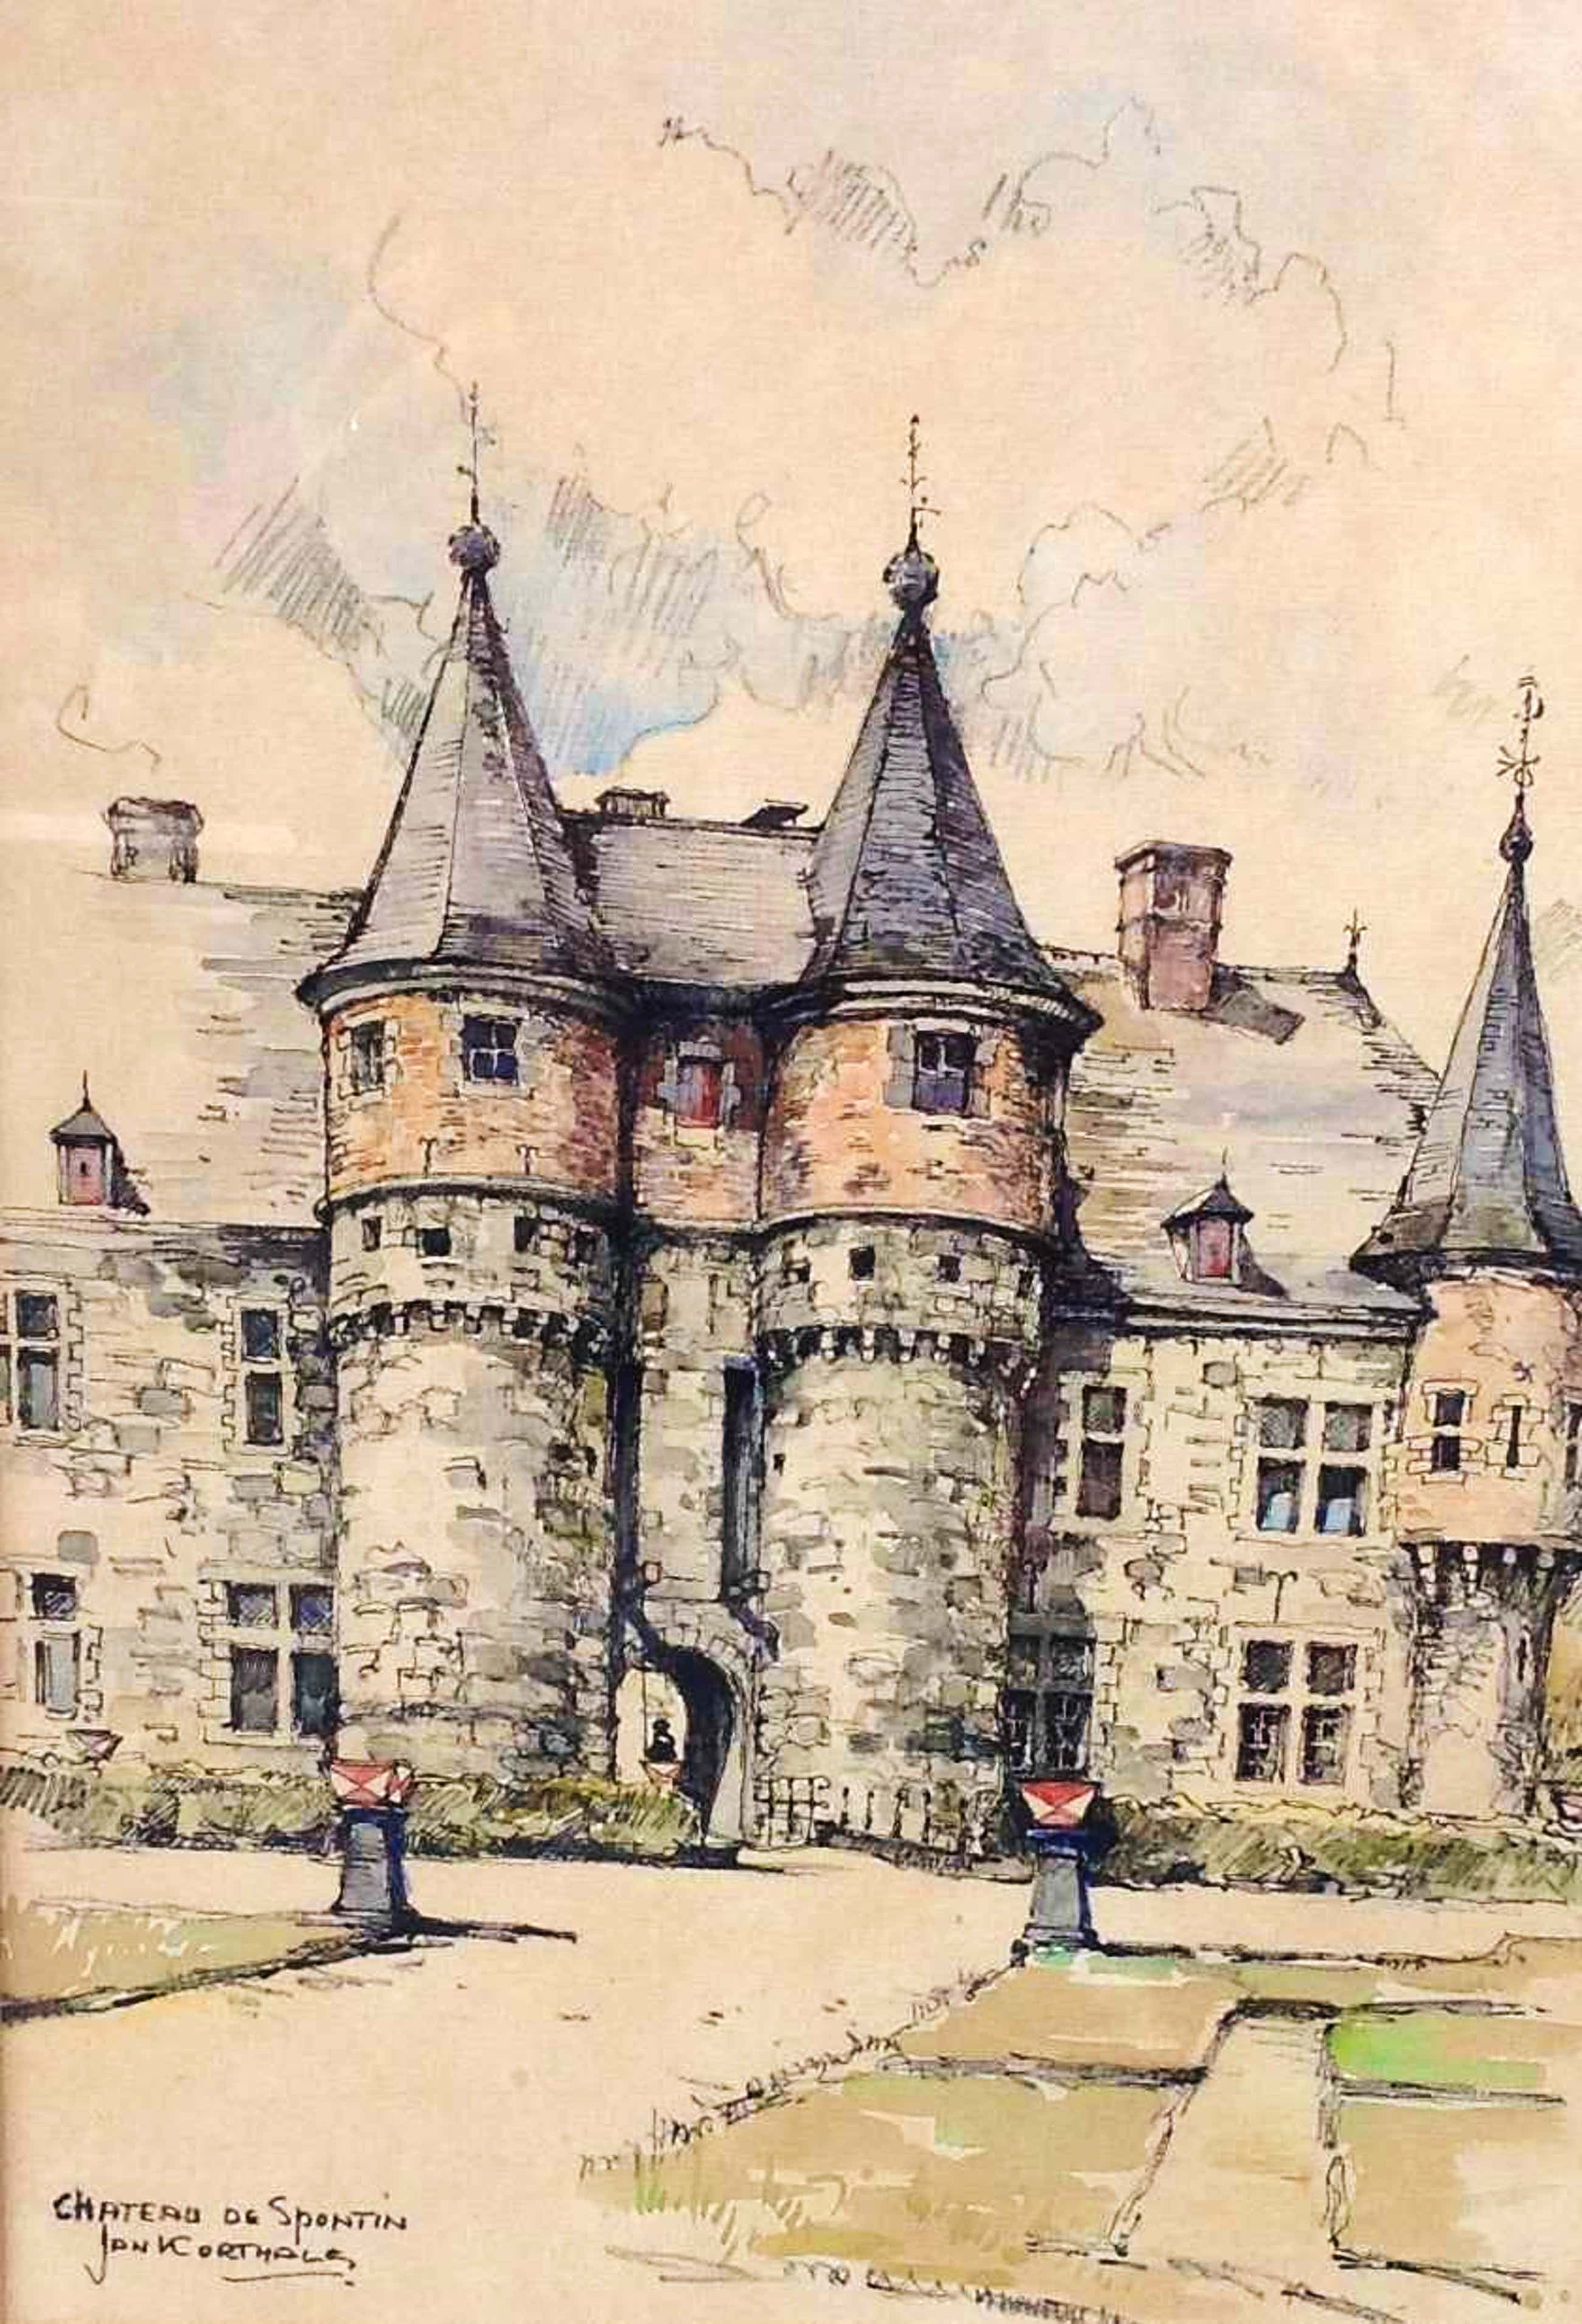 Jan Korthals - Chateau de Spontin kopen? Bied vanaf 100!